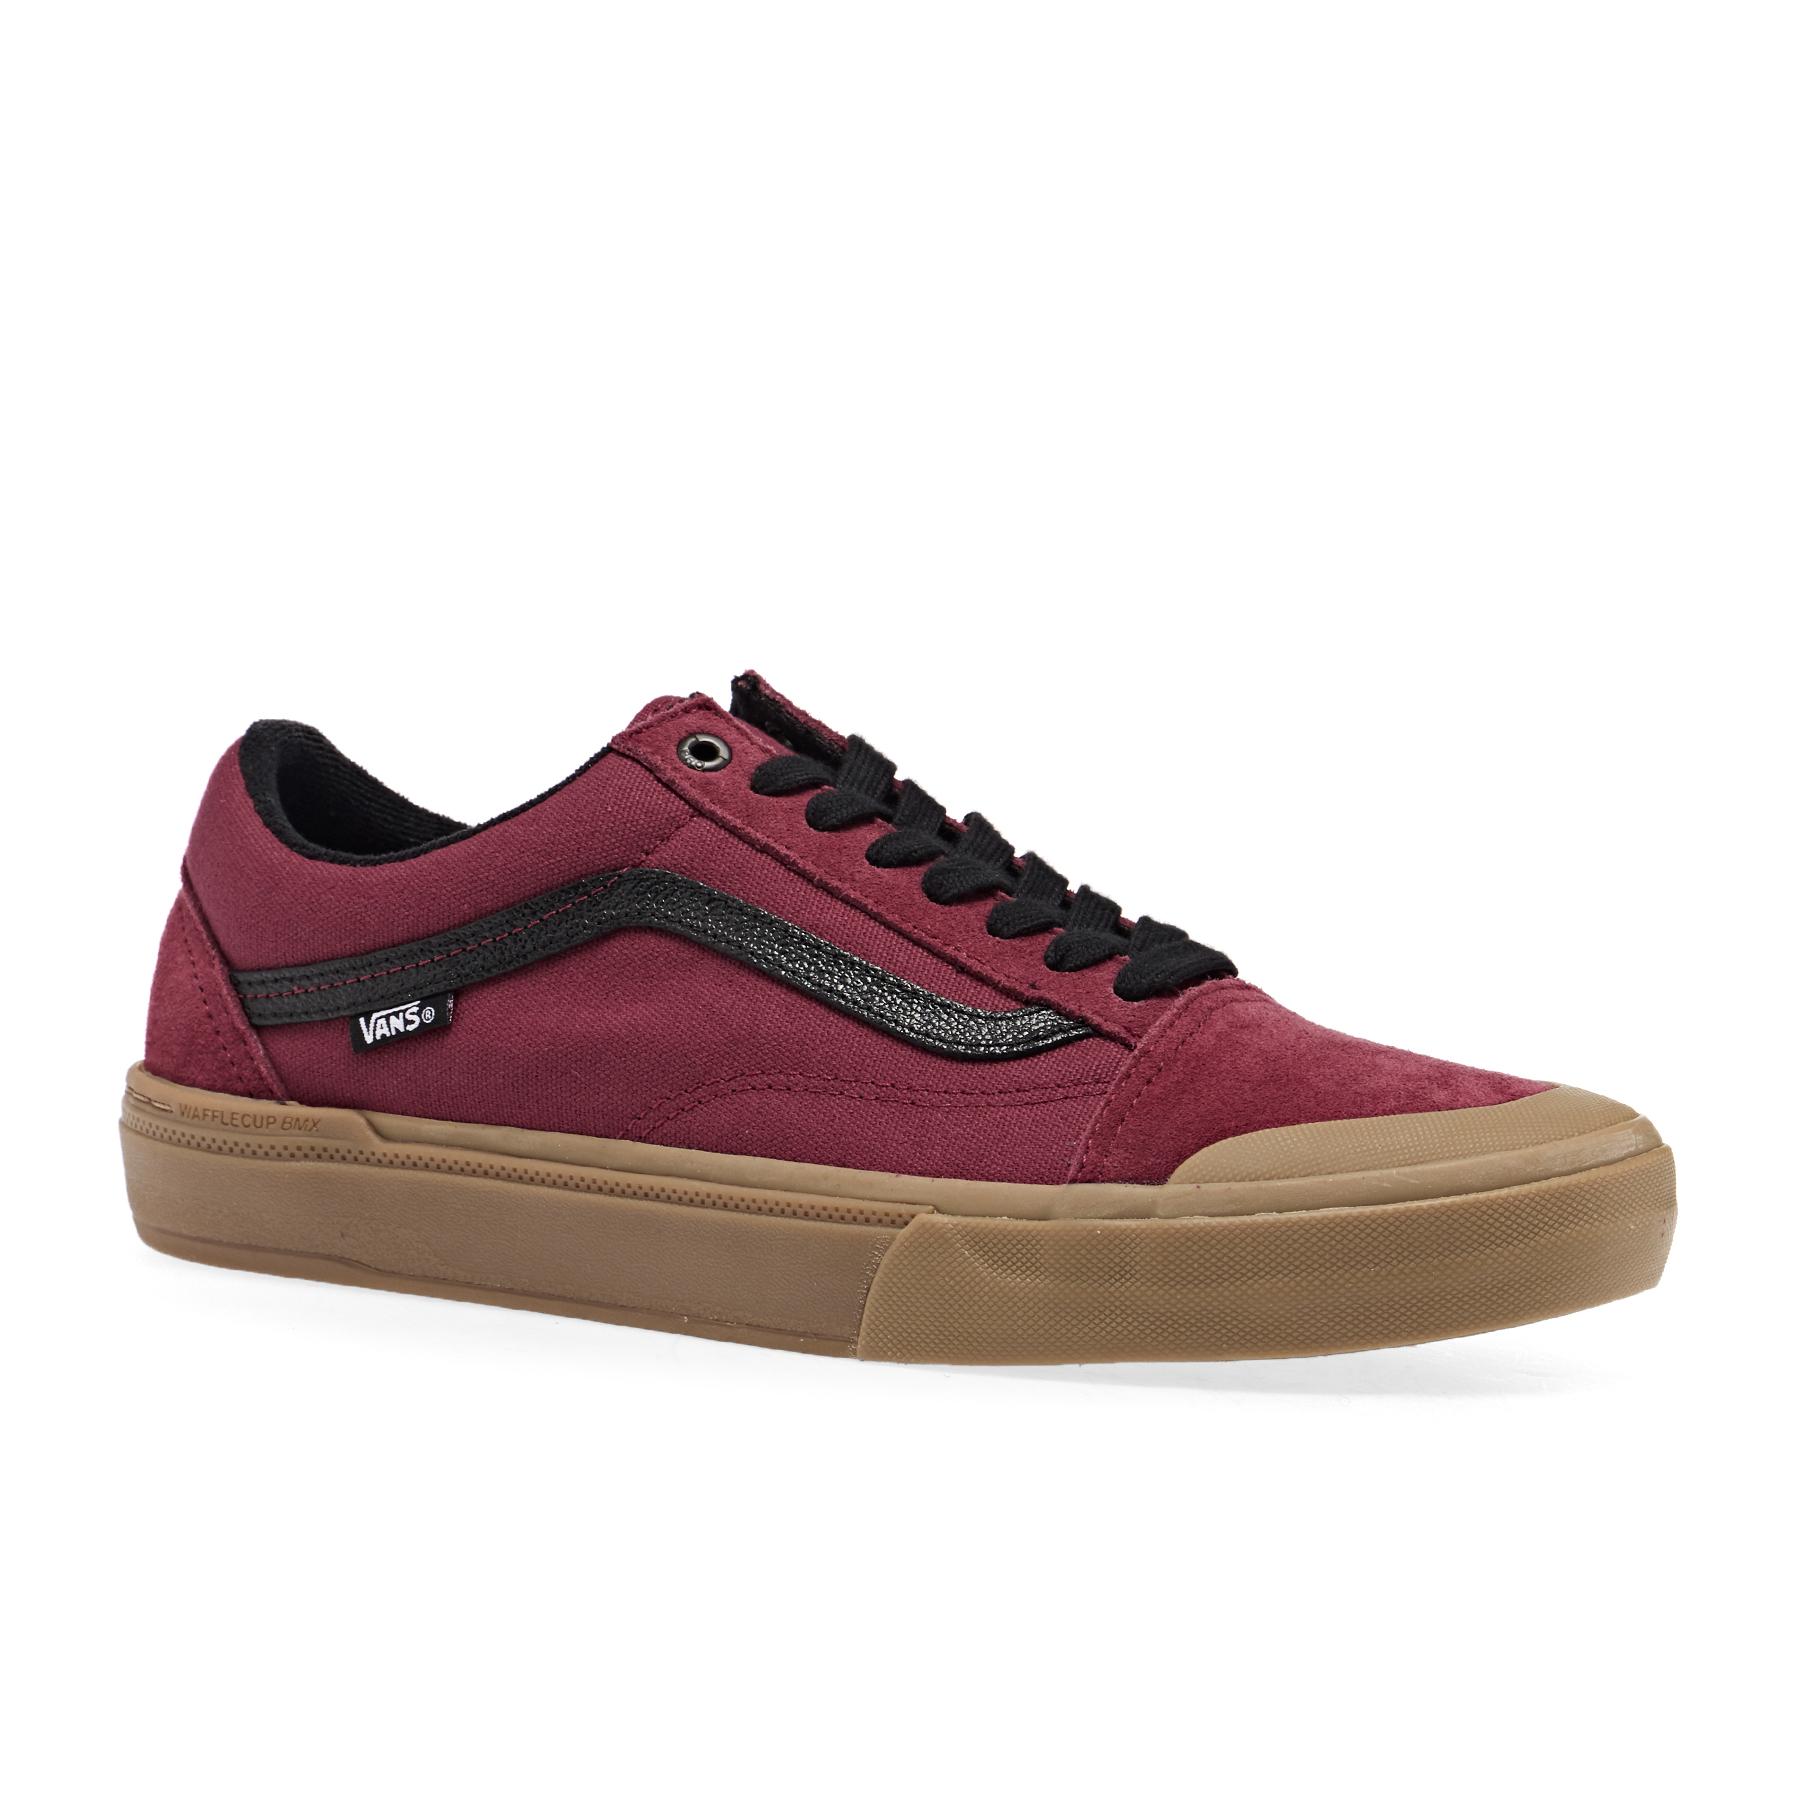 Vans Old Skool Pro Bmx Shoes - Free